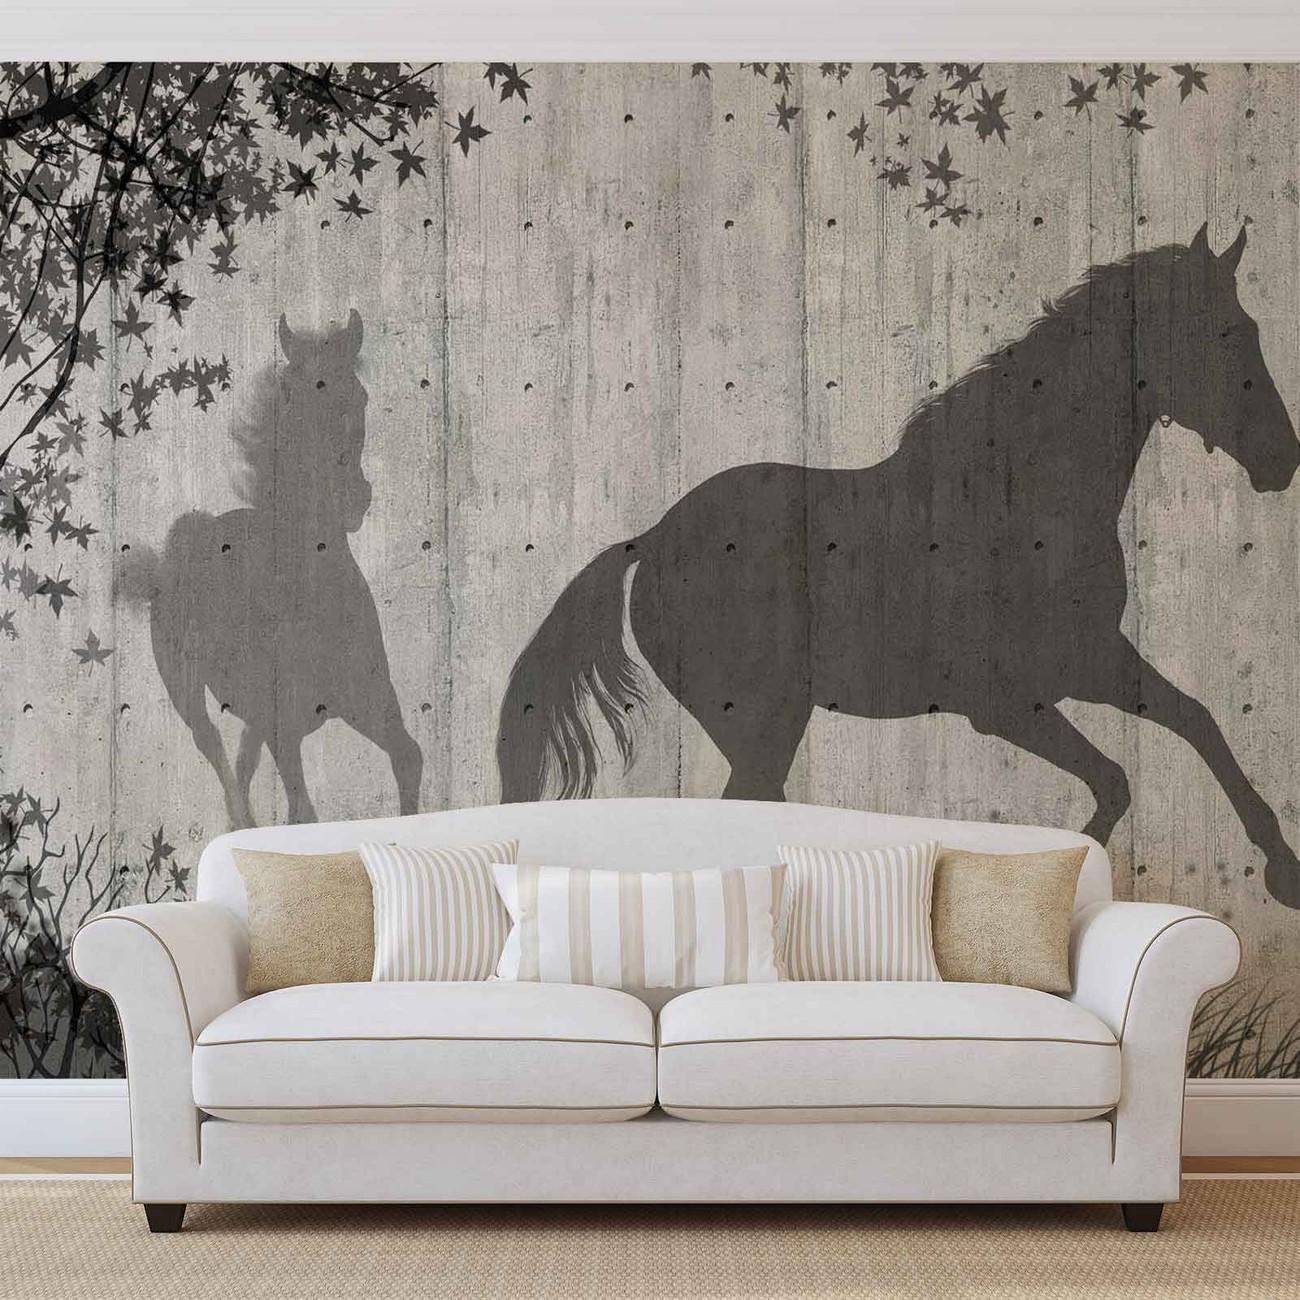 fototapete tapete pferde baum bl ttern wand bei. Black Bedroom Furniture Sets. Home Design Ideas